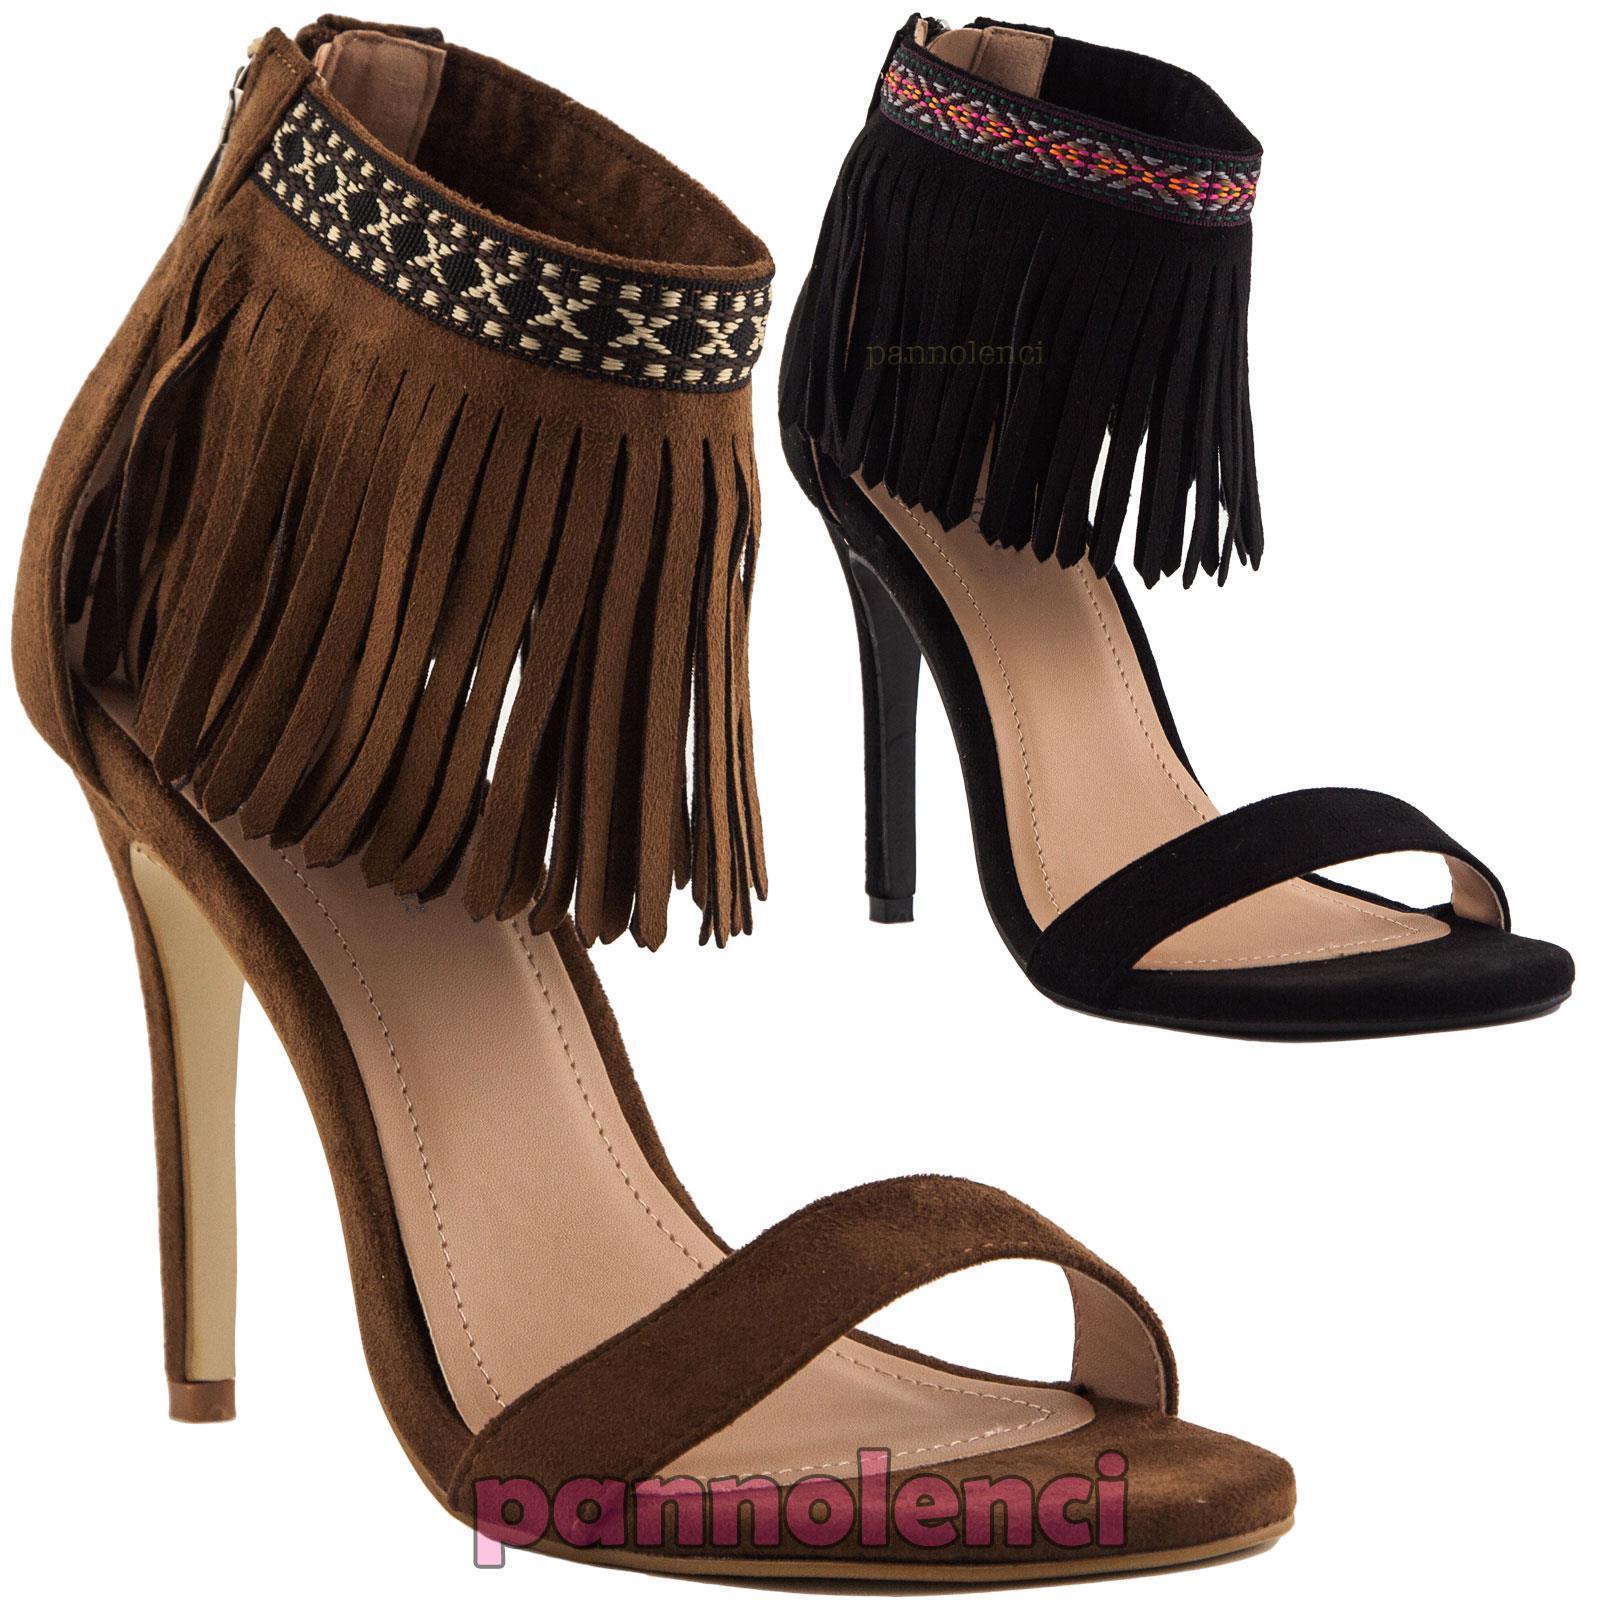 Women's shoes sandals suede strap fringes heels eco-leather new EK126